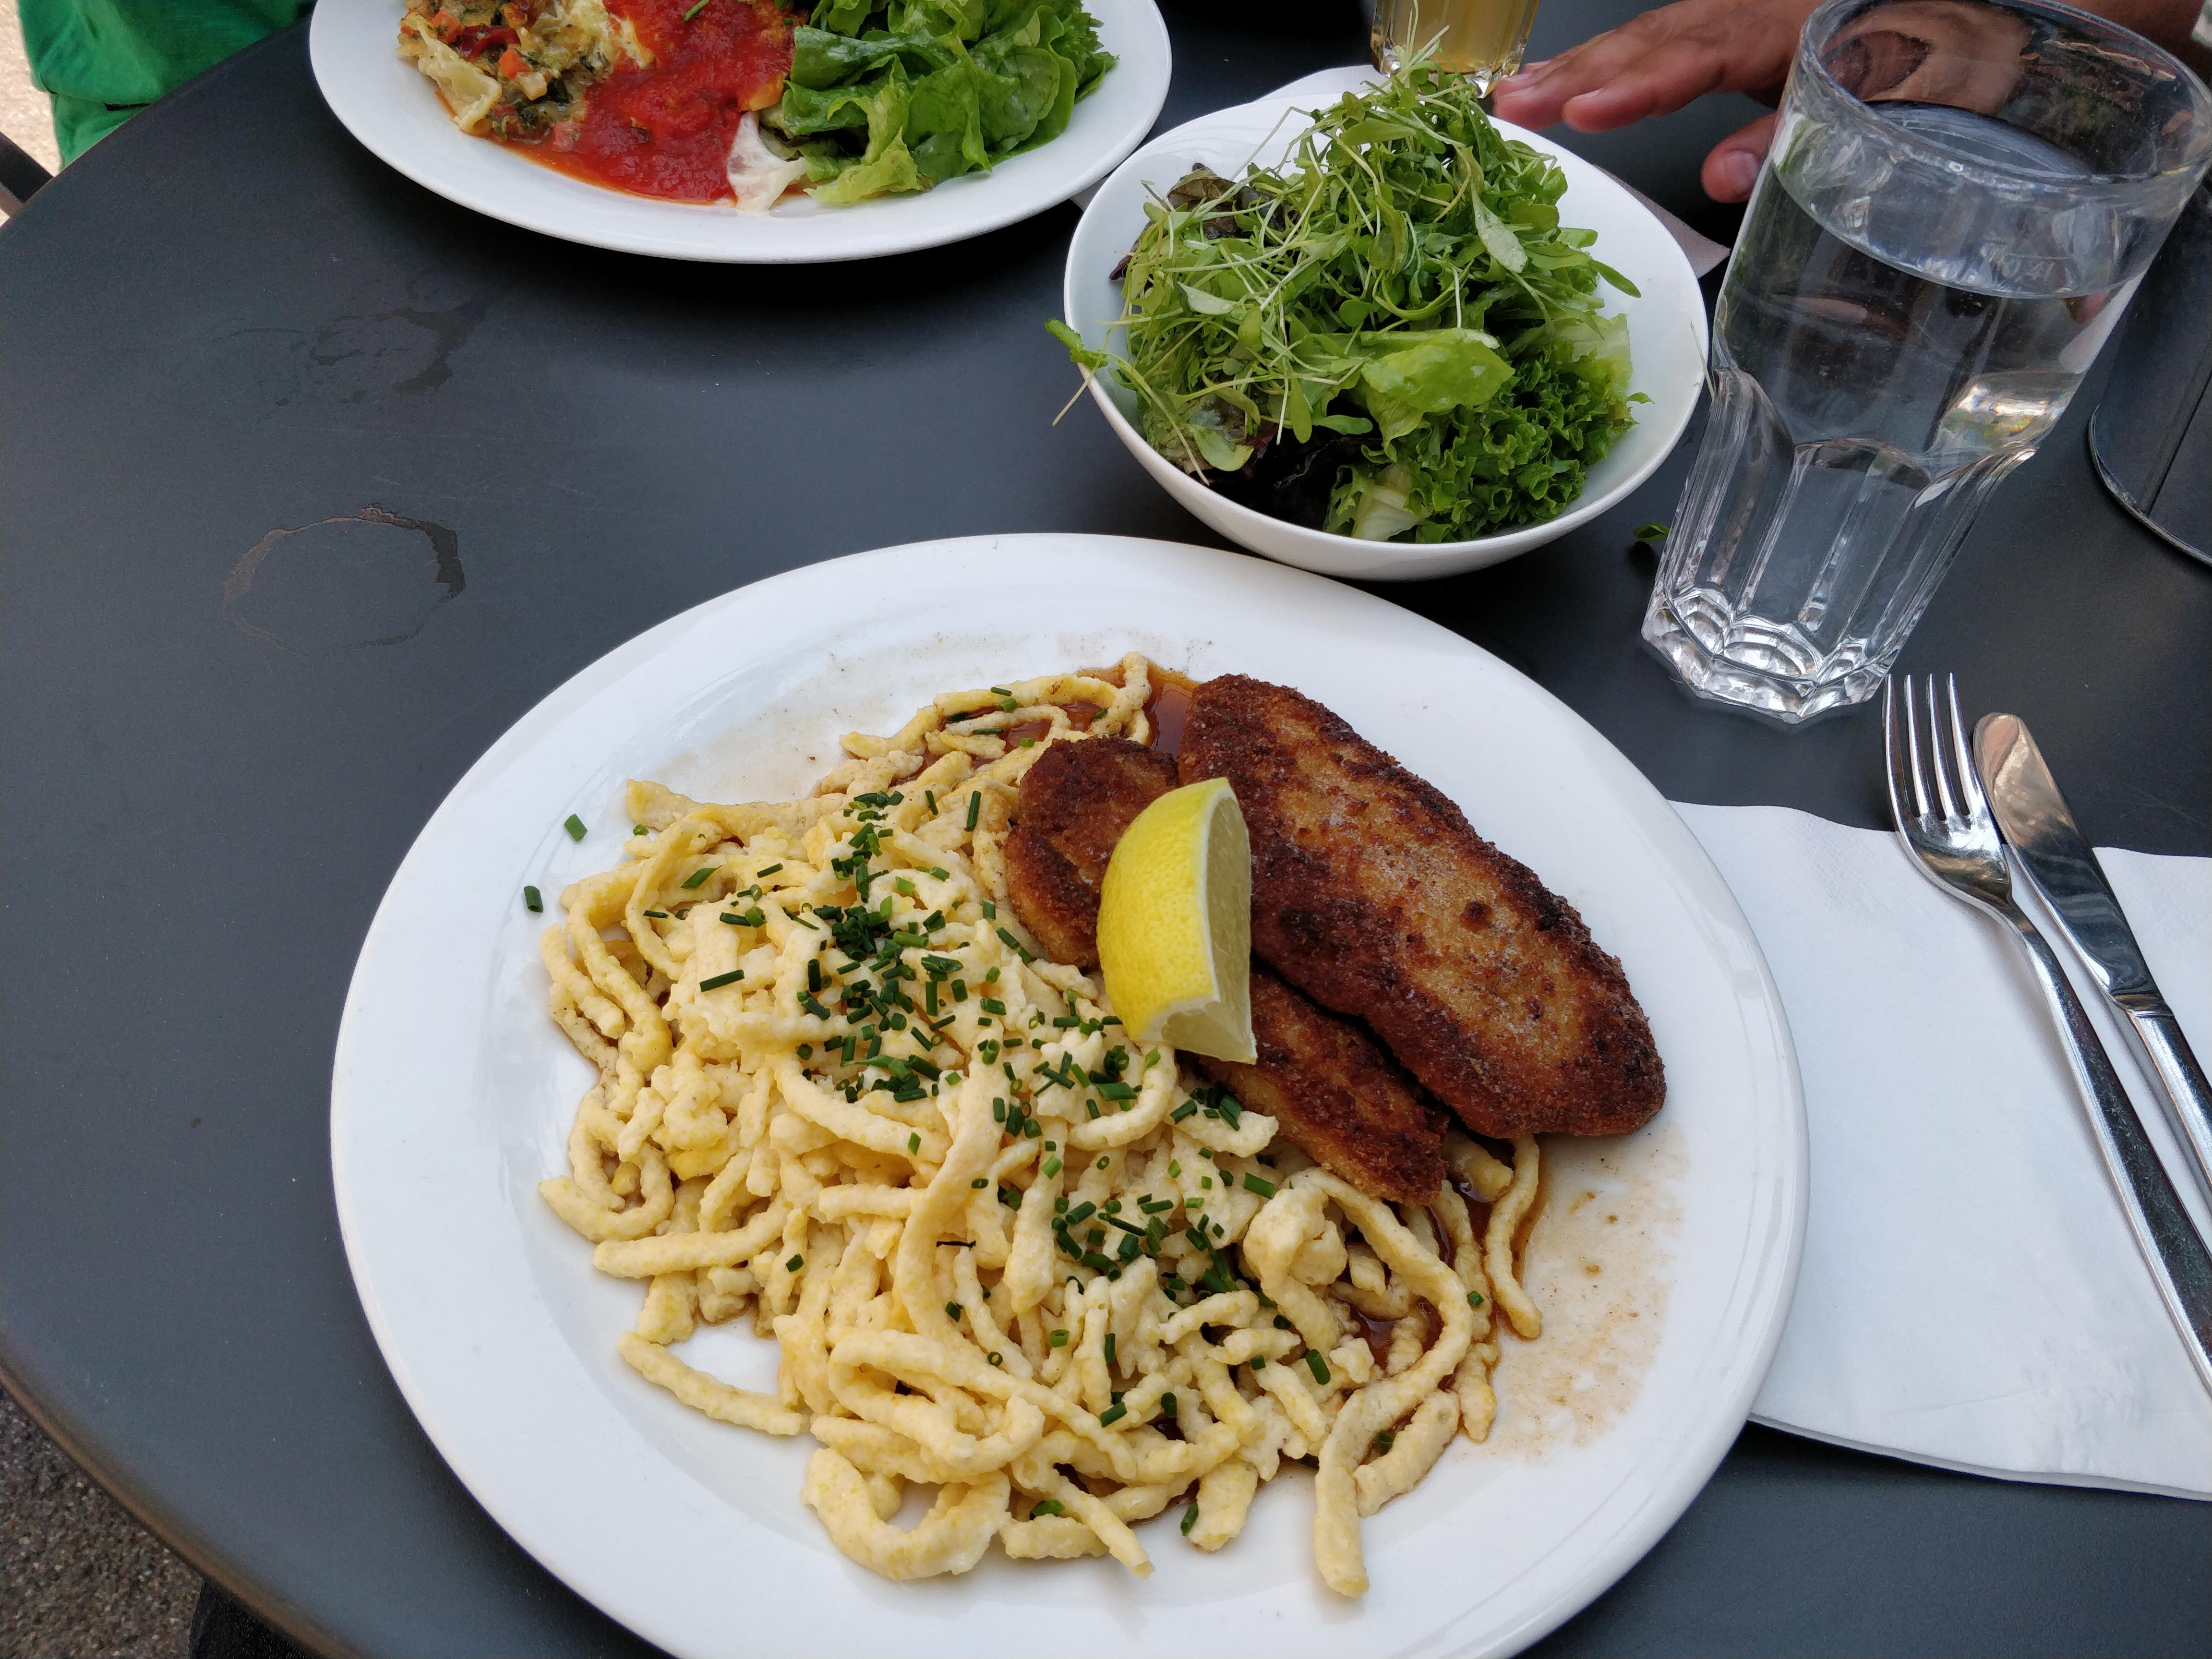 https://foodloader.net/nico_2018-07-24_schnitzel-mit-spaetzle.jpg